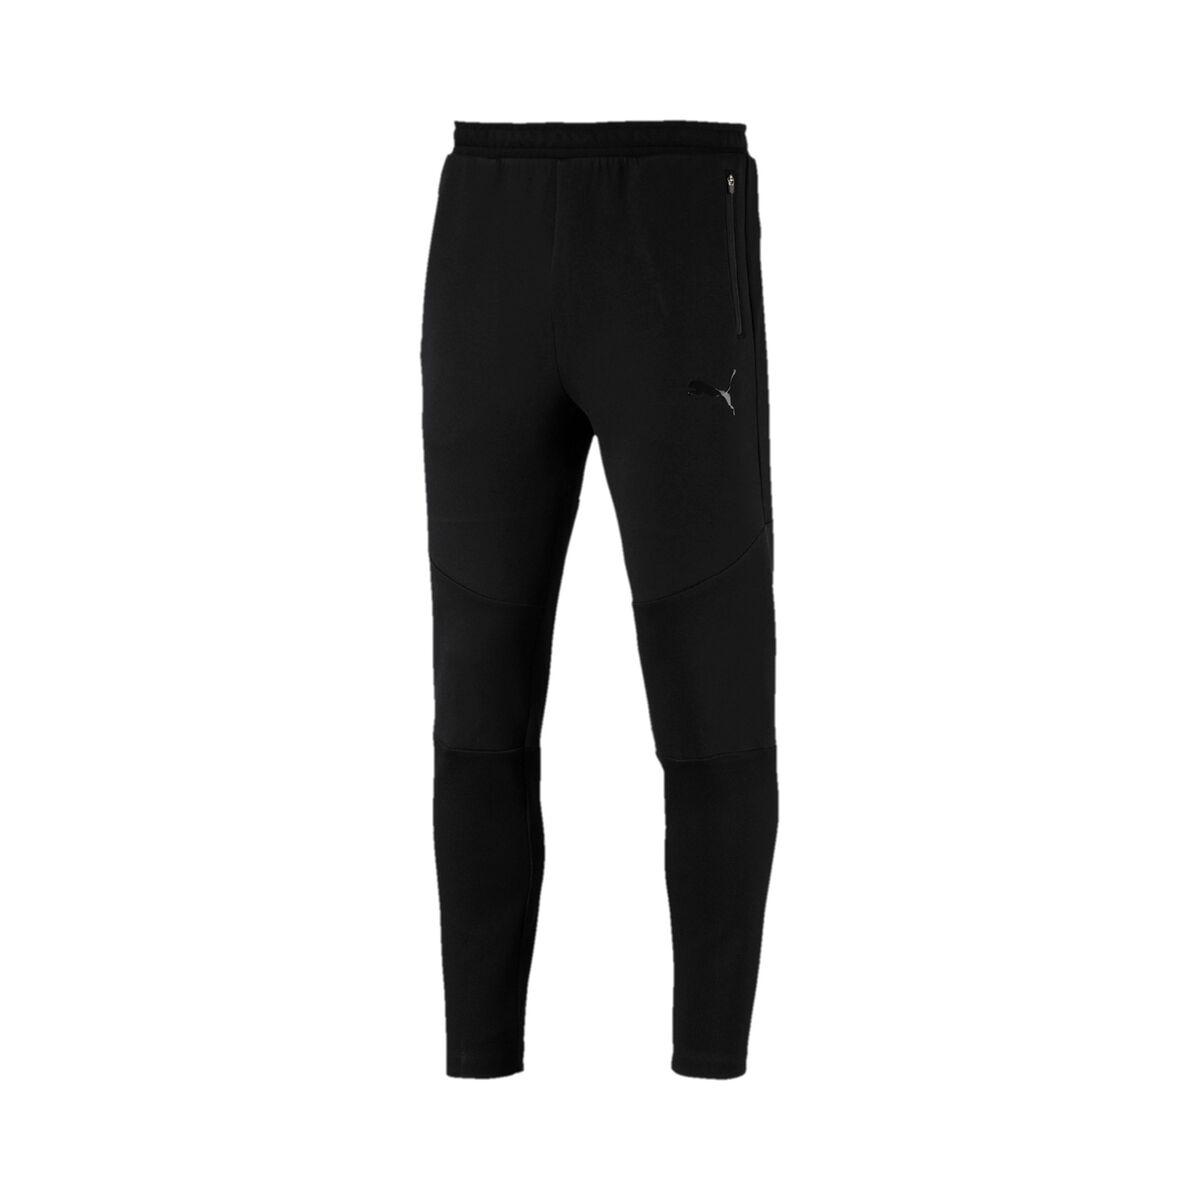 PUMA Pantalon de sport Evostripe move pants